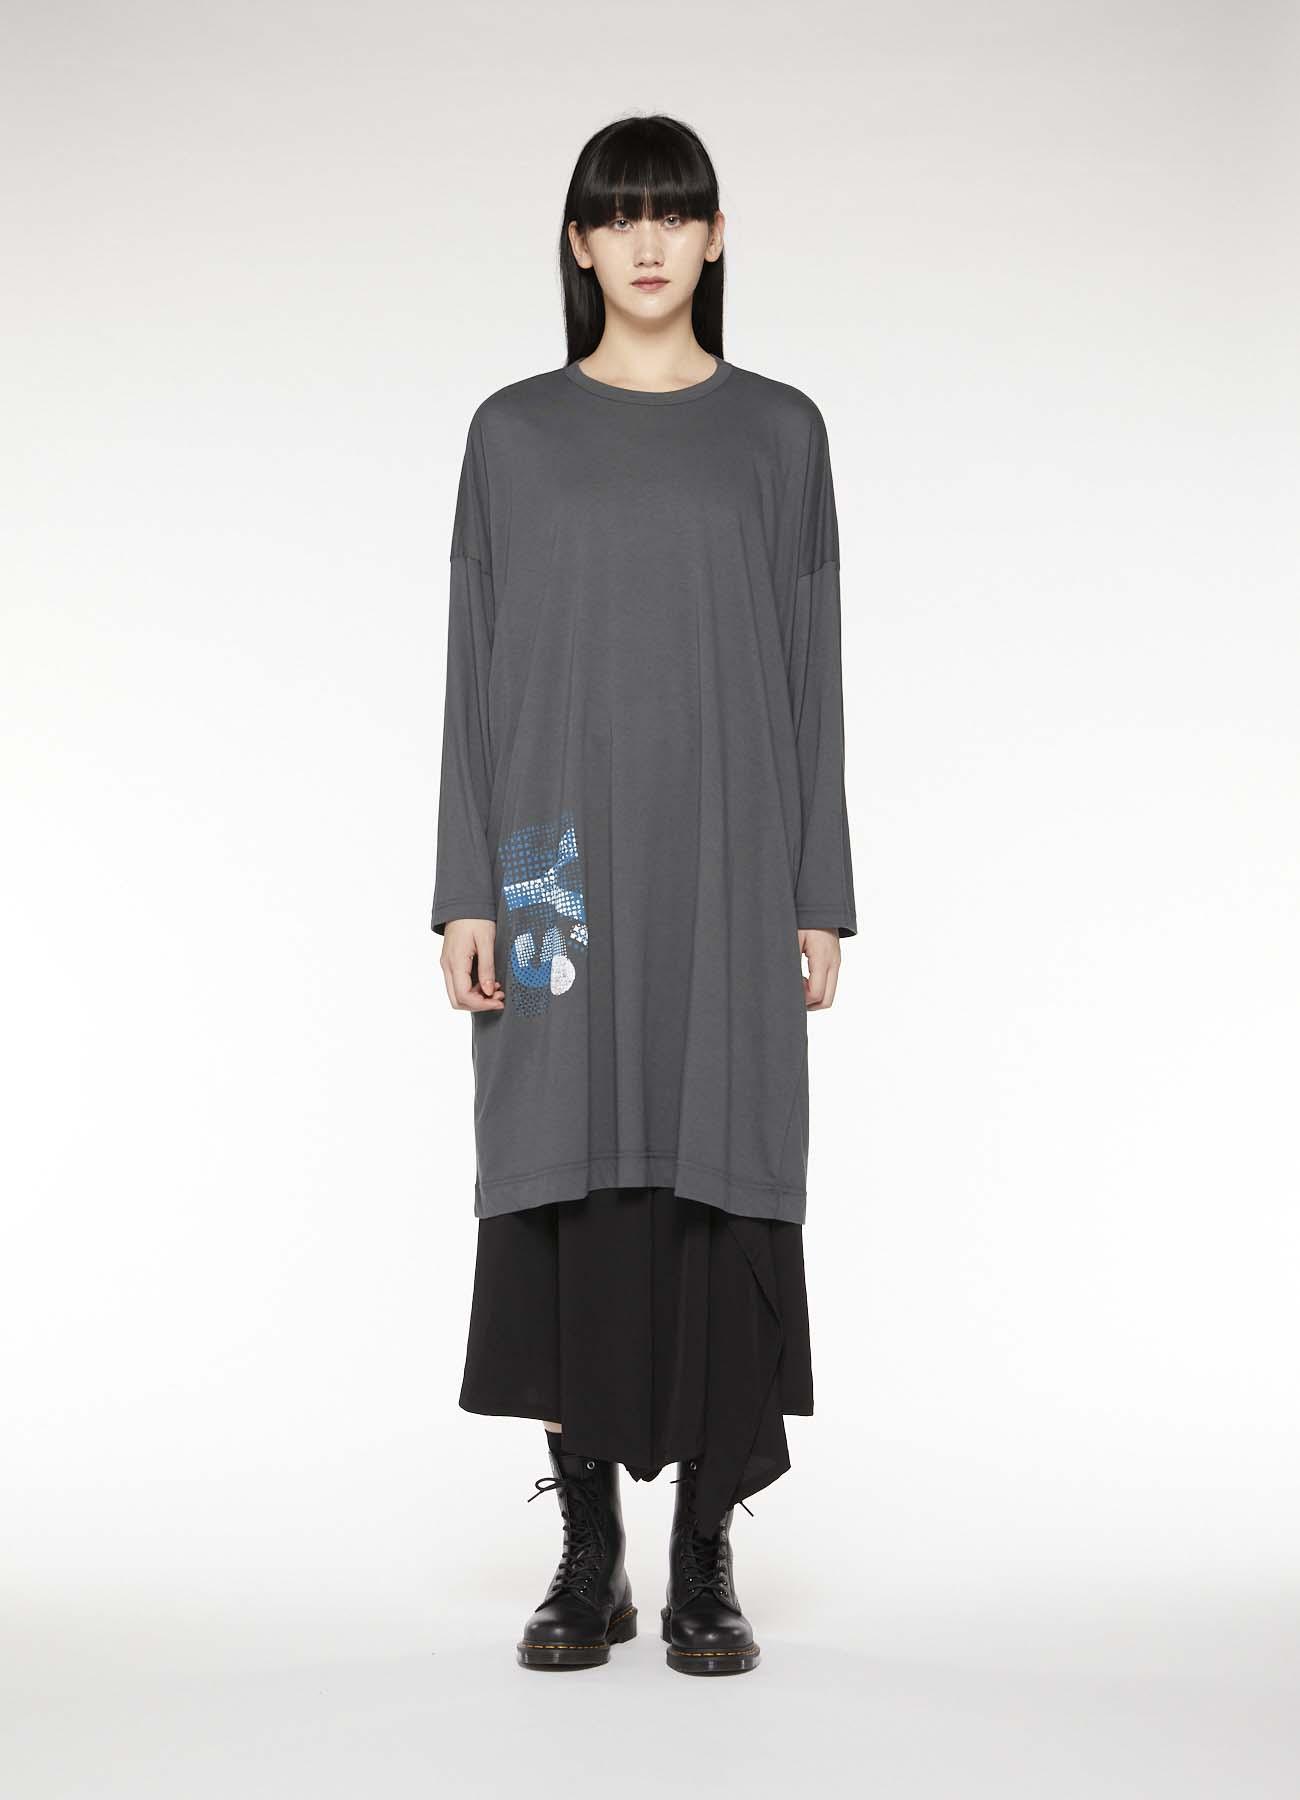 COTTON COLLAGE PRINT LONG SLEEVE DRESS